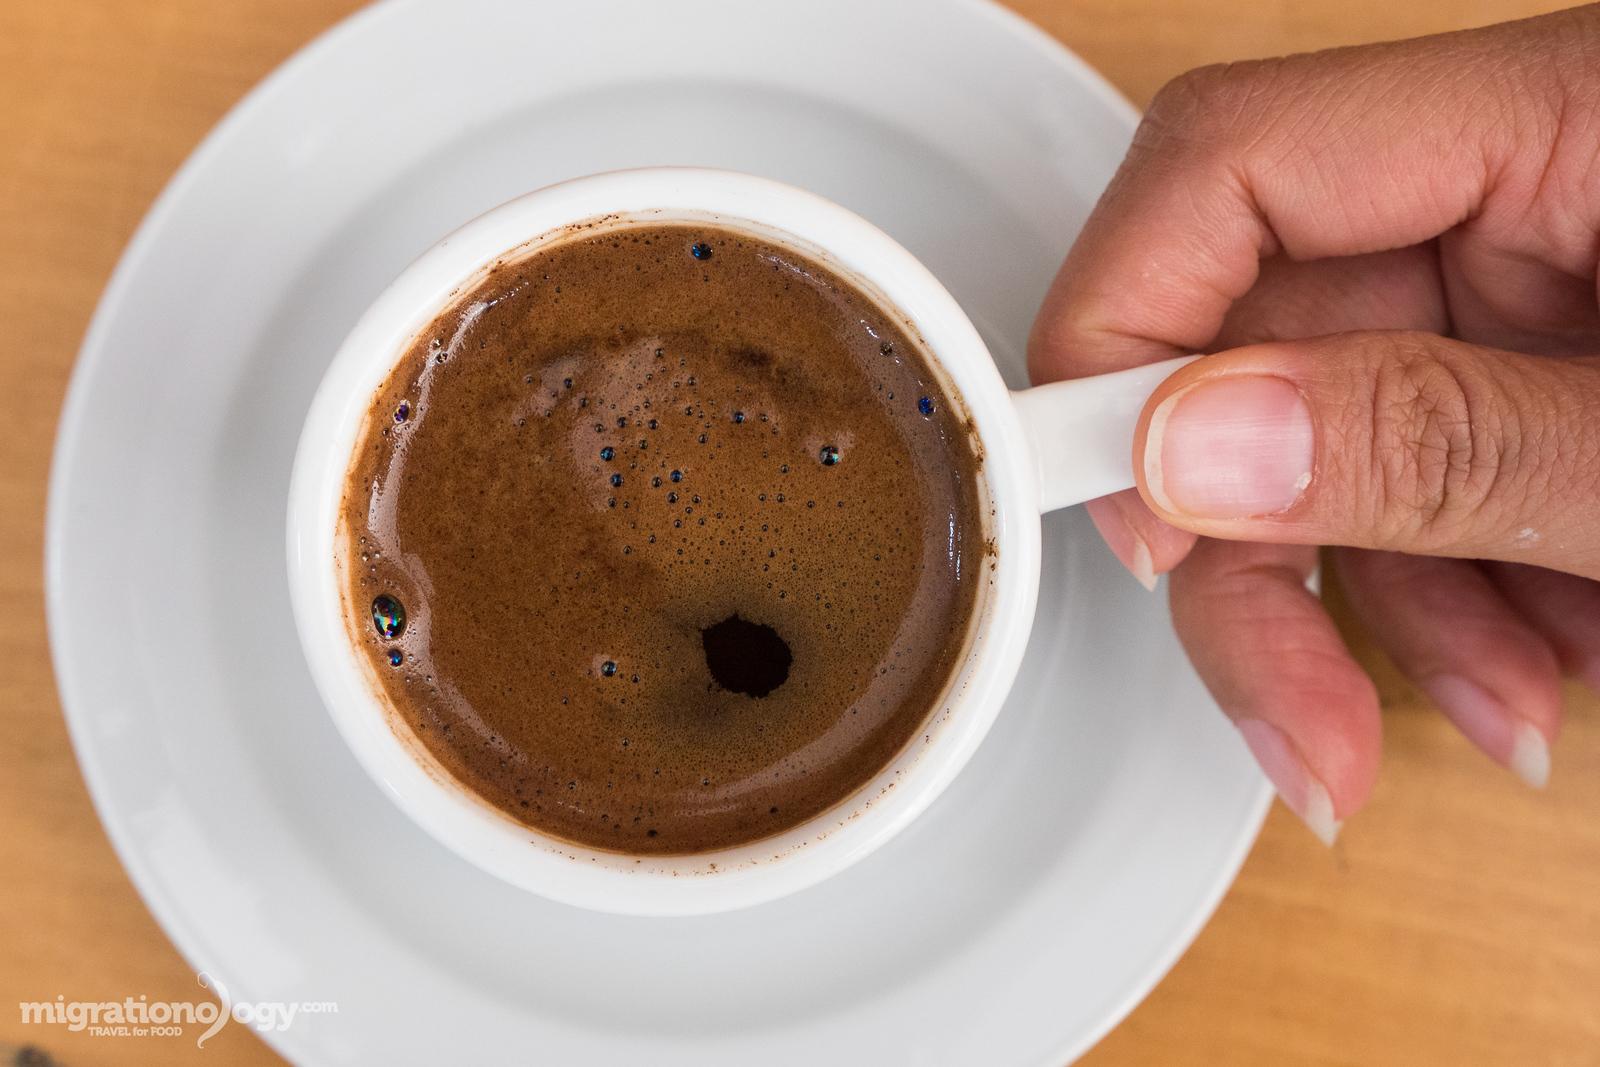 Jordanian coffee and tea